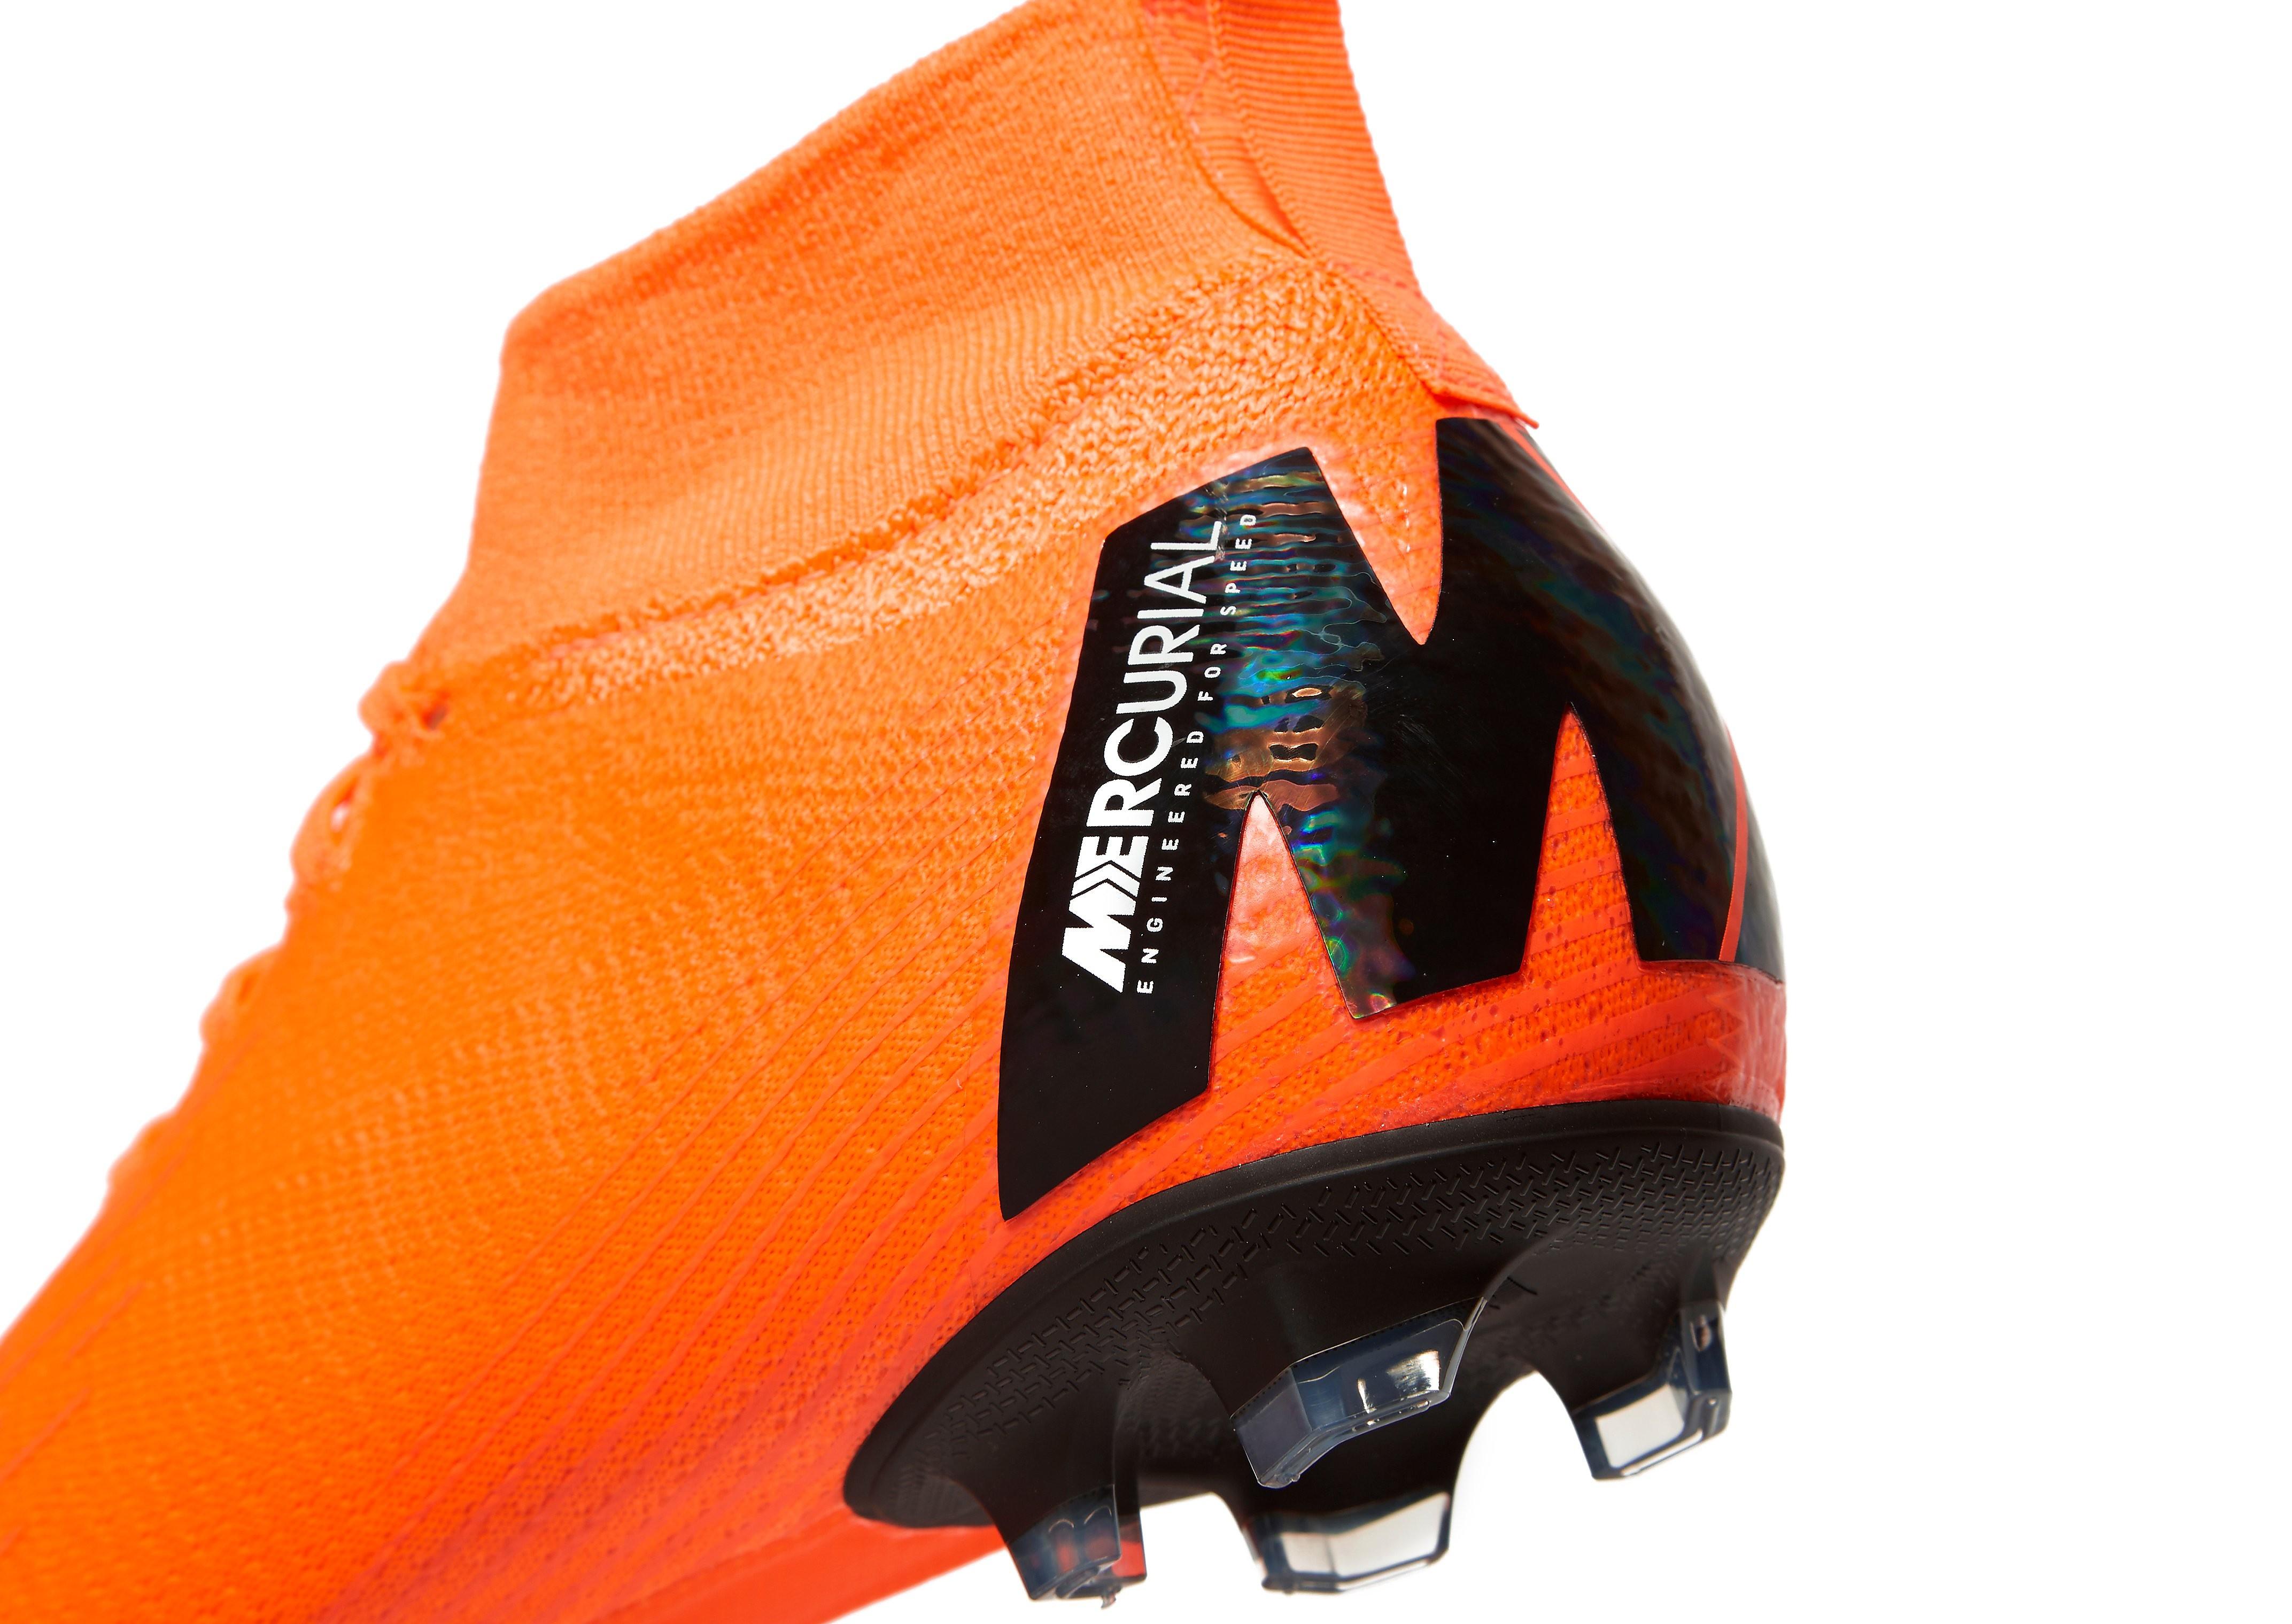 Nike Mercurial 360 Superfly Elite Dynamic Fit FG Junior